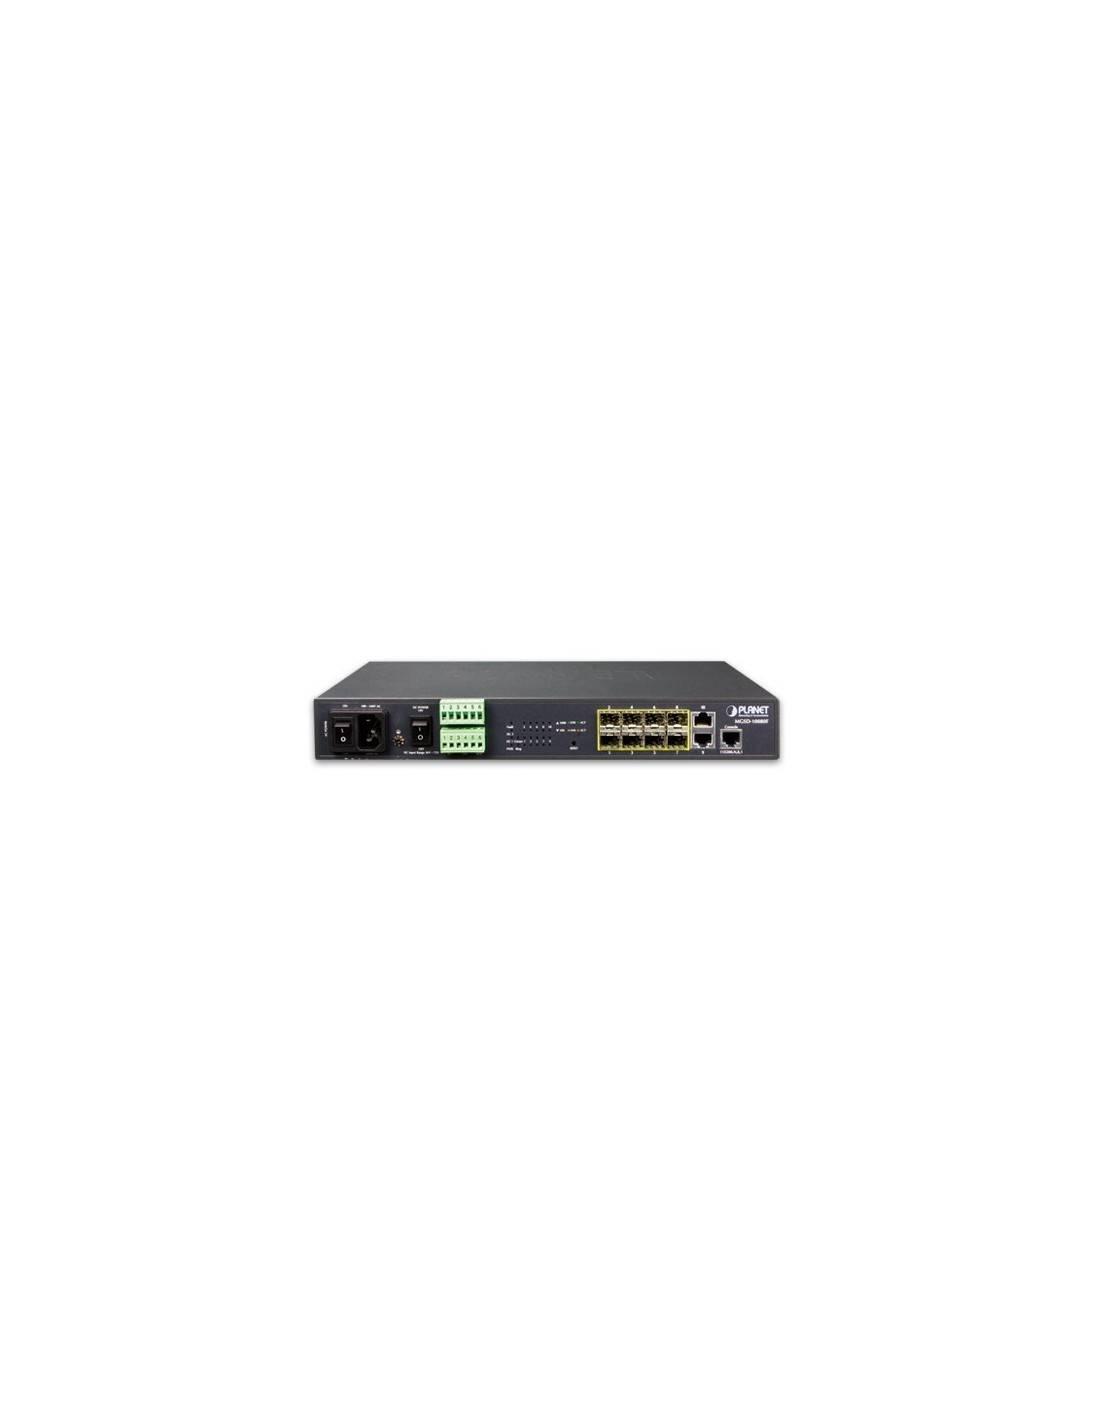 Switch 8 port Gigabit SFP modules + 2 ports RJ45 10-100-1000 Mb/s